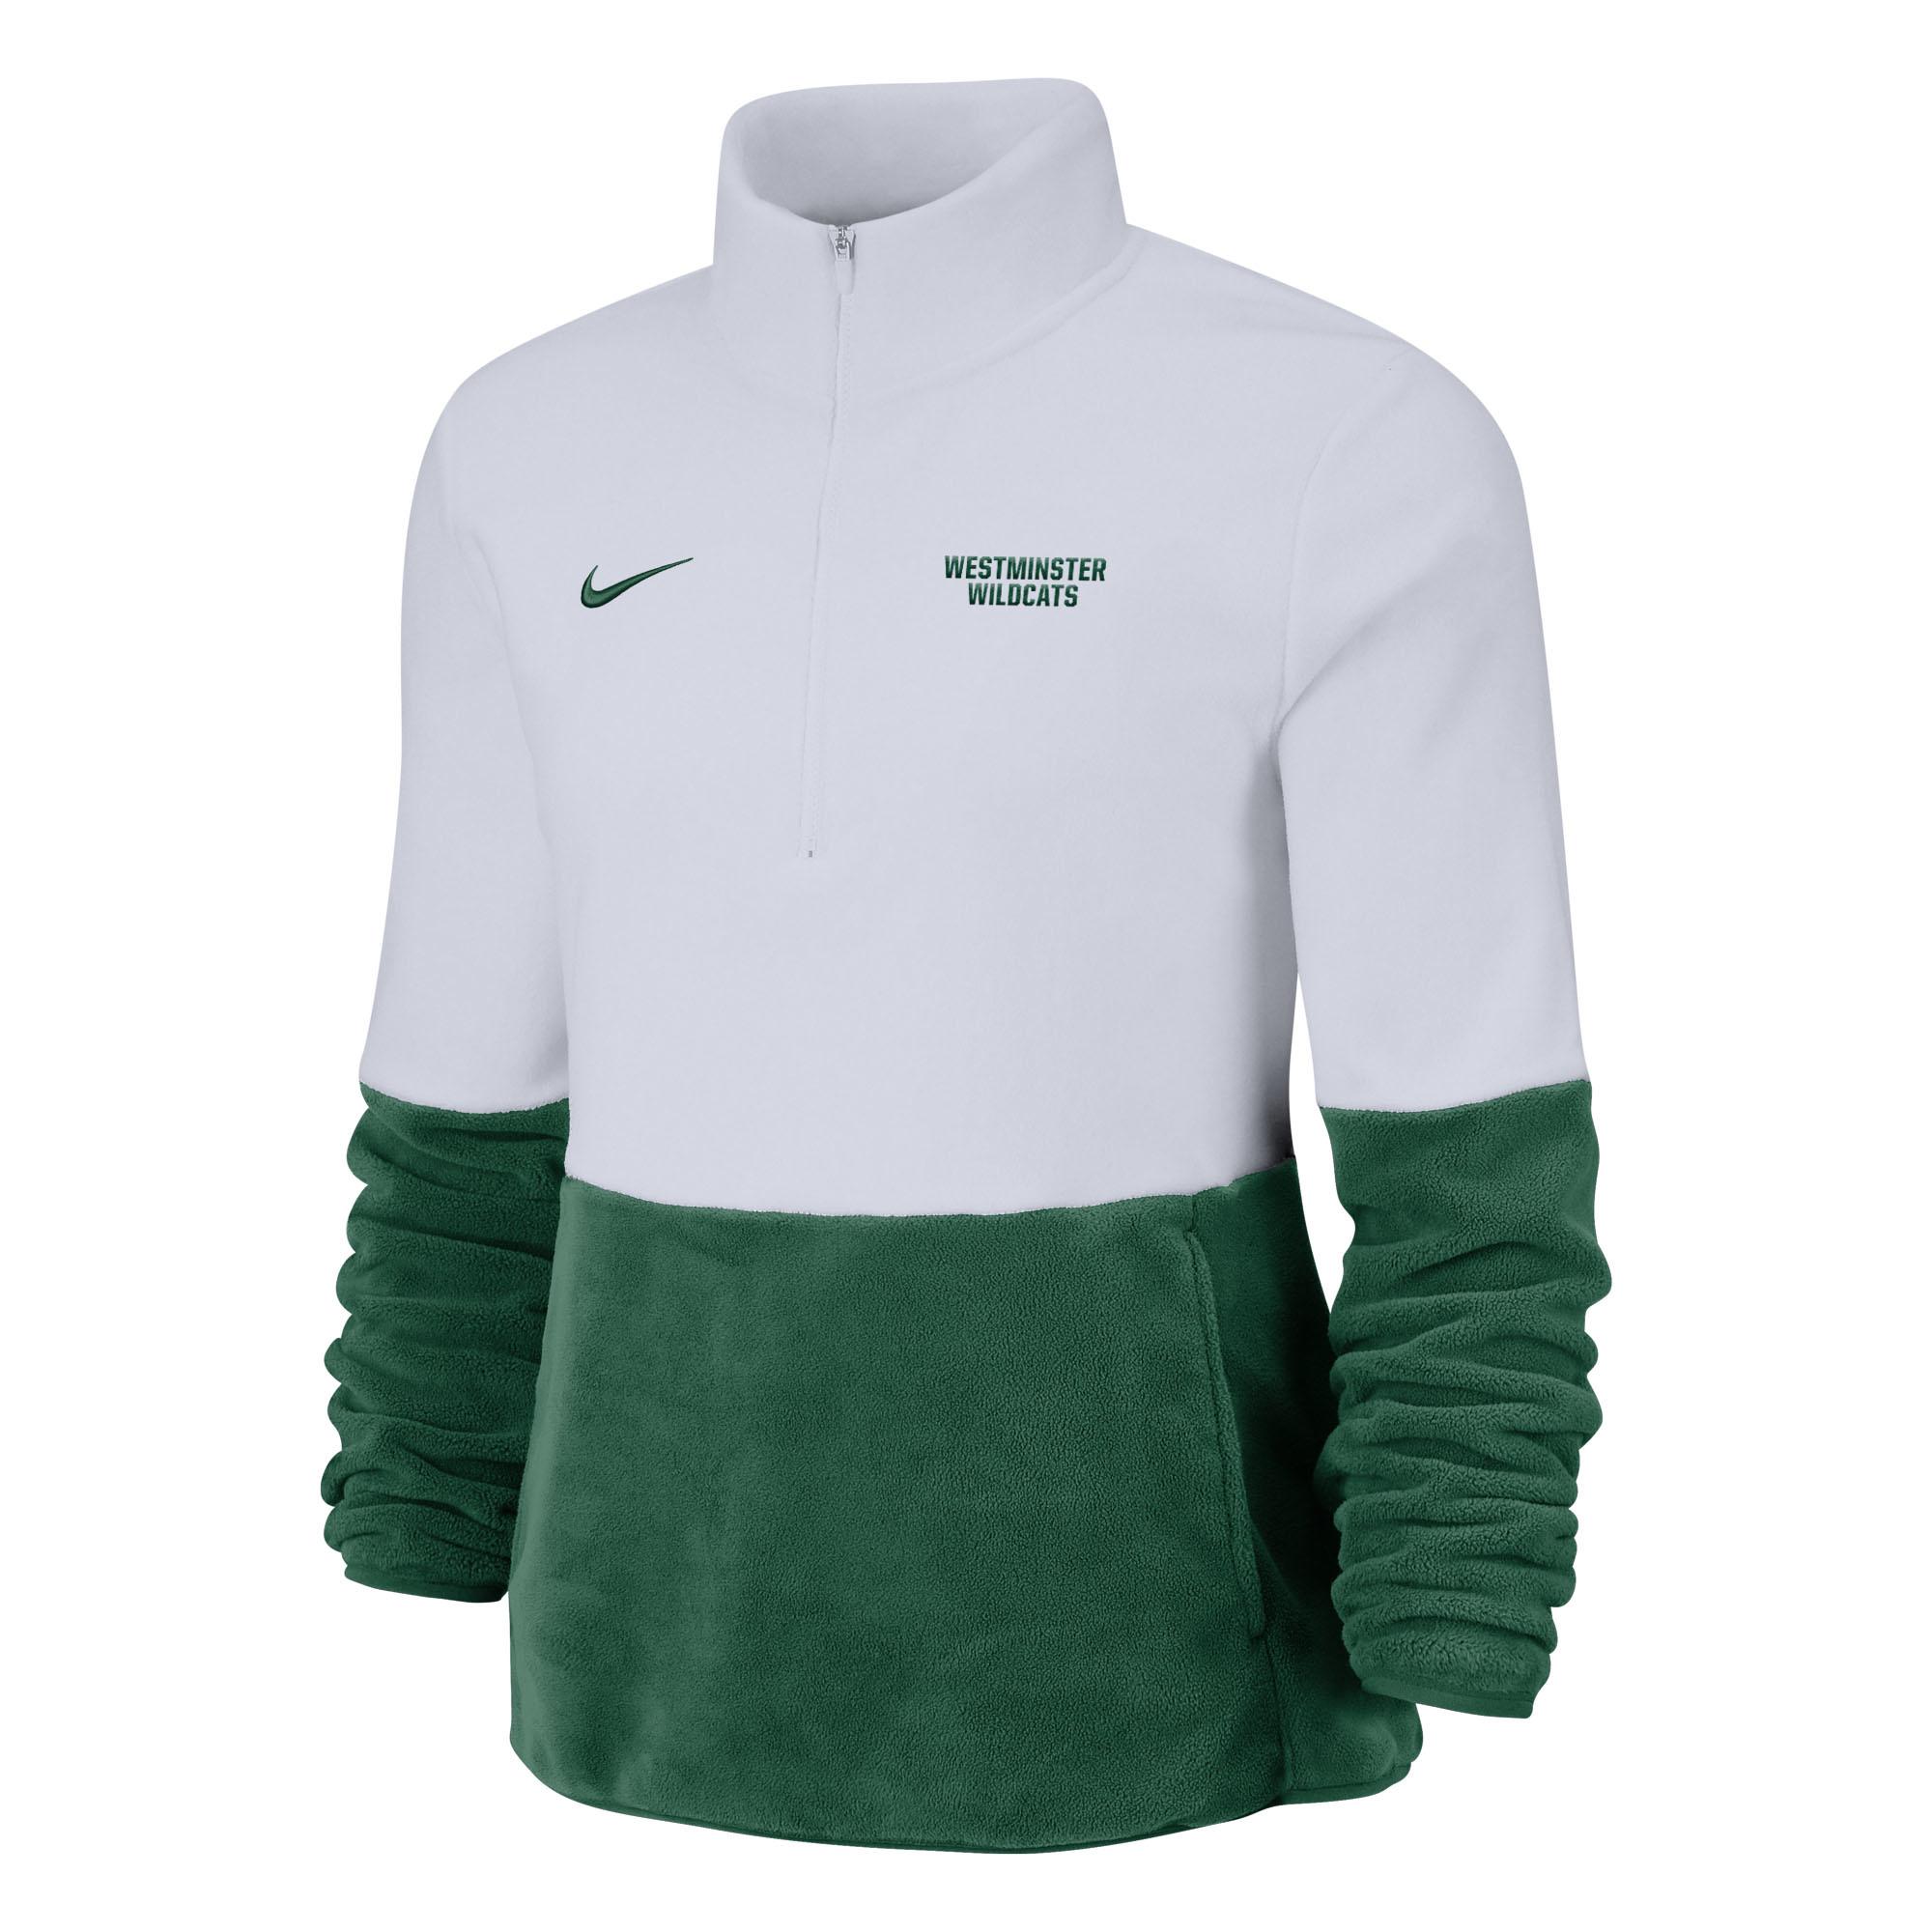 Nike Pullover: Nike Womens Thermal Fleece Half Zip Color Block White/Green